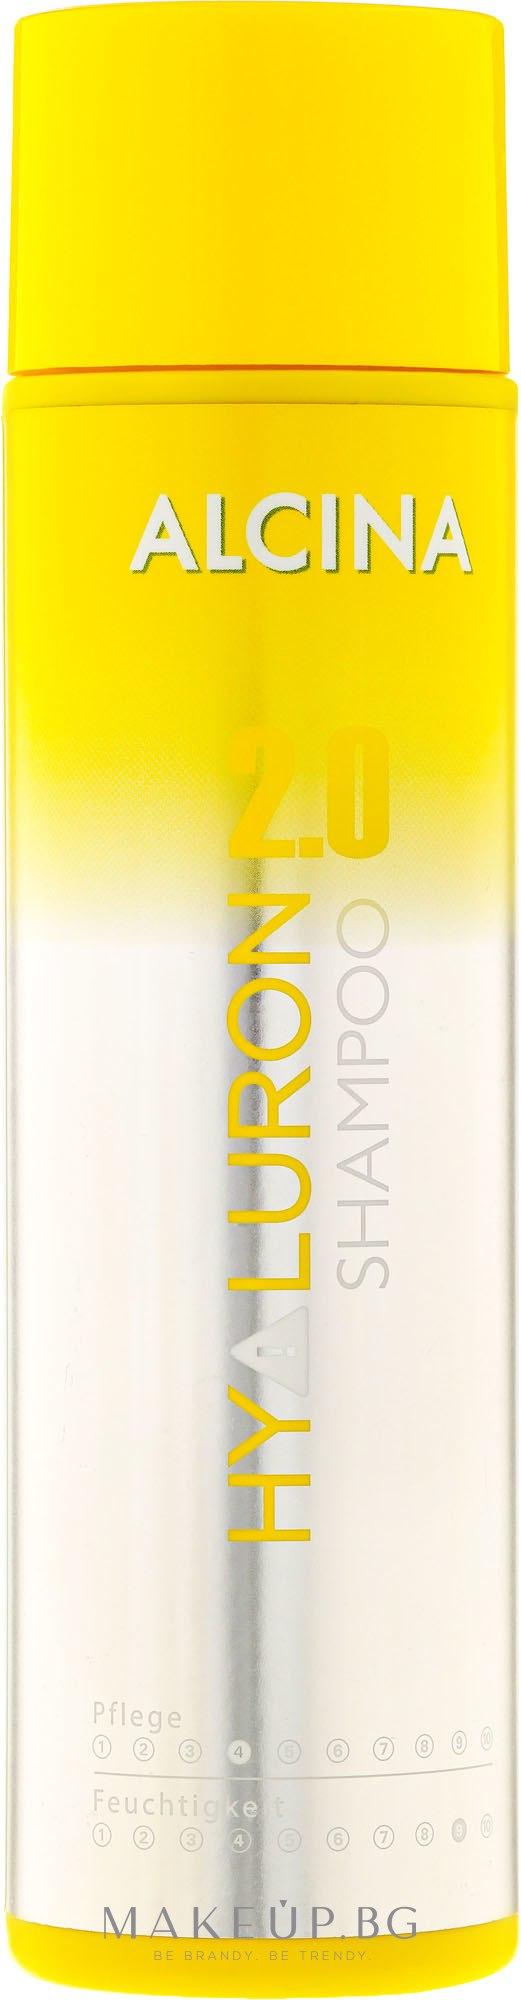 Хидратиращ шампоан с хиалуронова киселина - Alcina Hyaluron Shampoo — снимка 250 ml